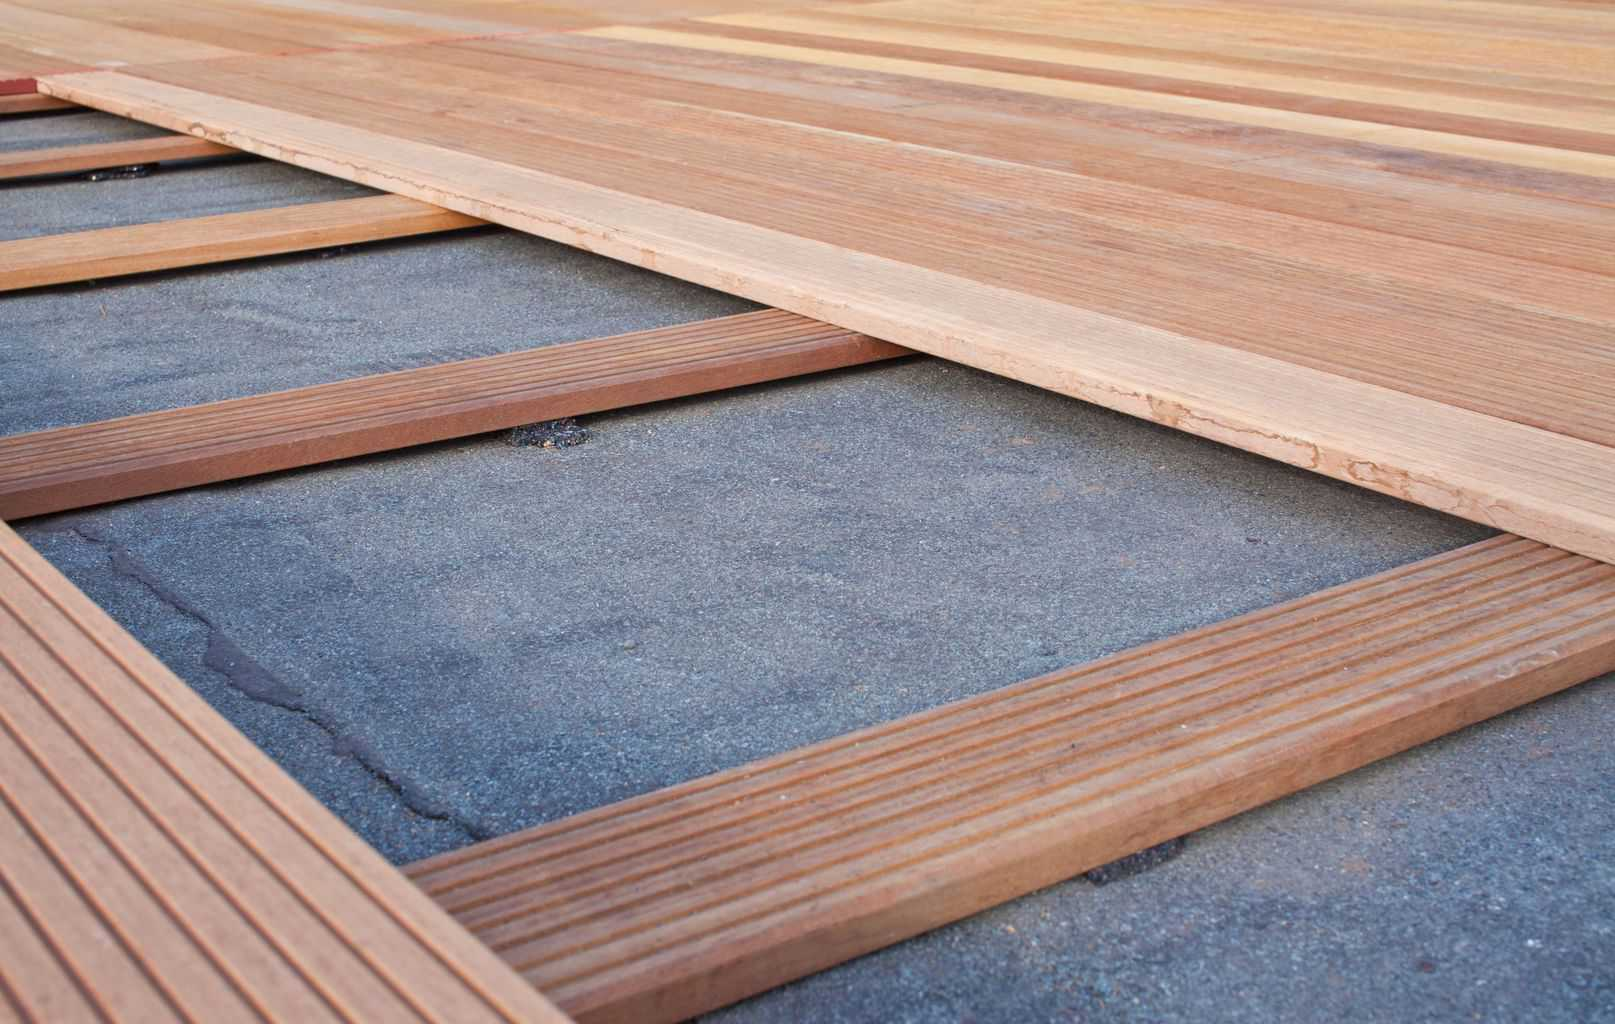 How to Install Floating Engineered Hardwood Floors Yourself